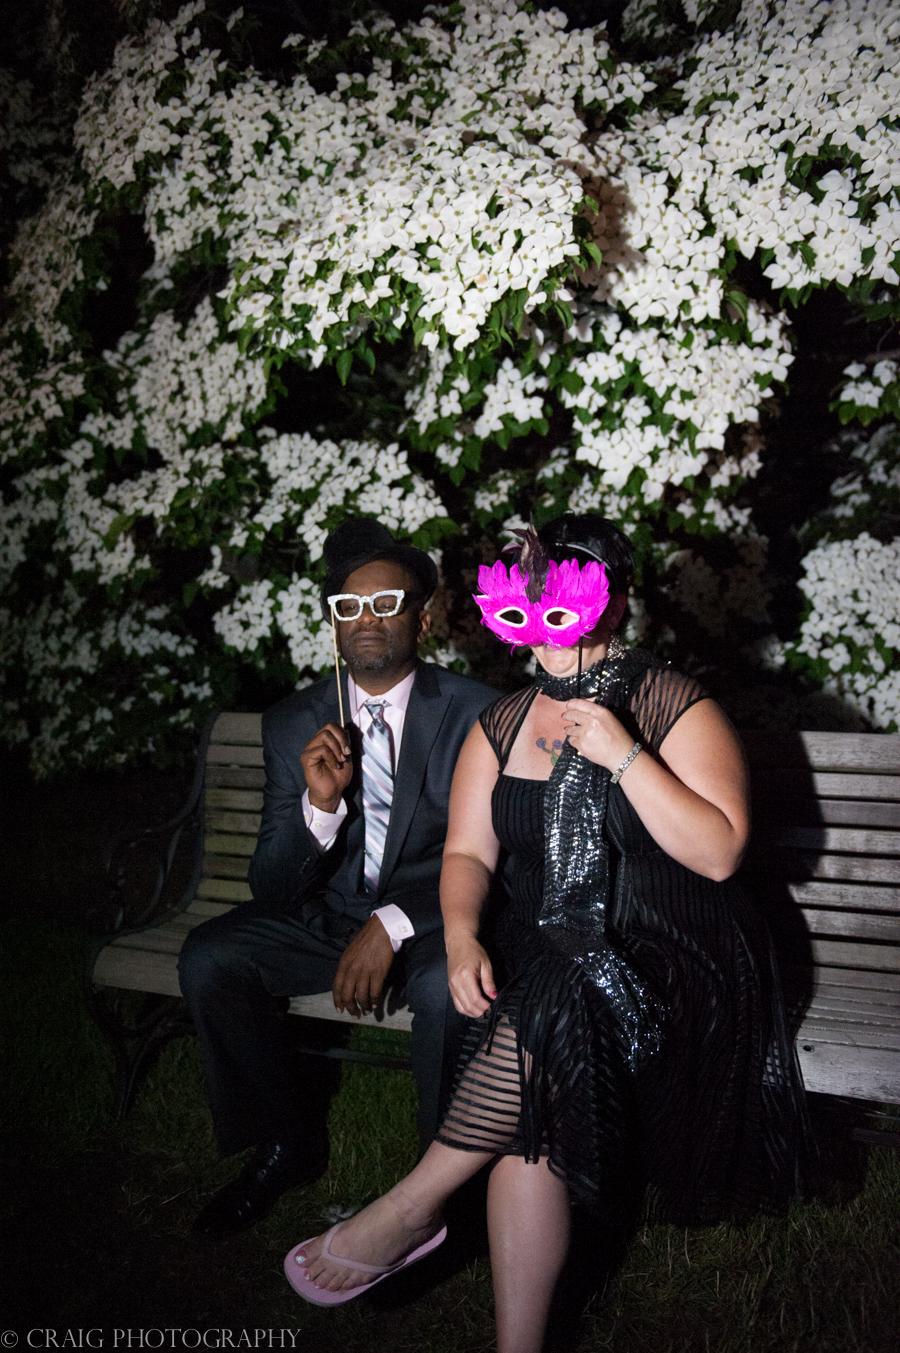 Phipps Conseratory Weddings | Wedding Photo Booth Homemade Moss Frame-0012